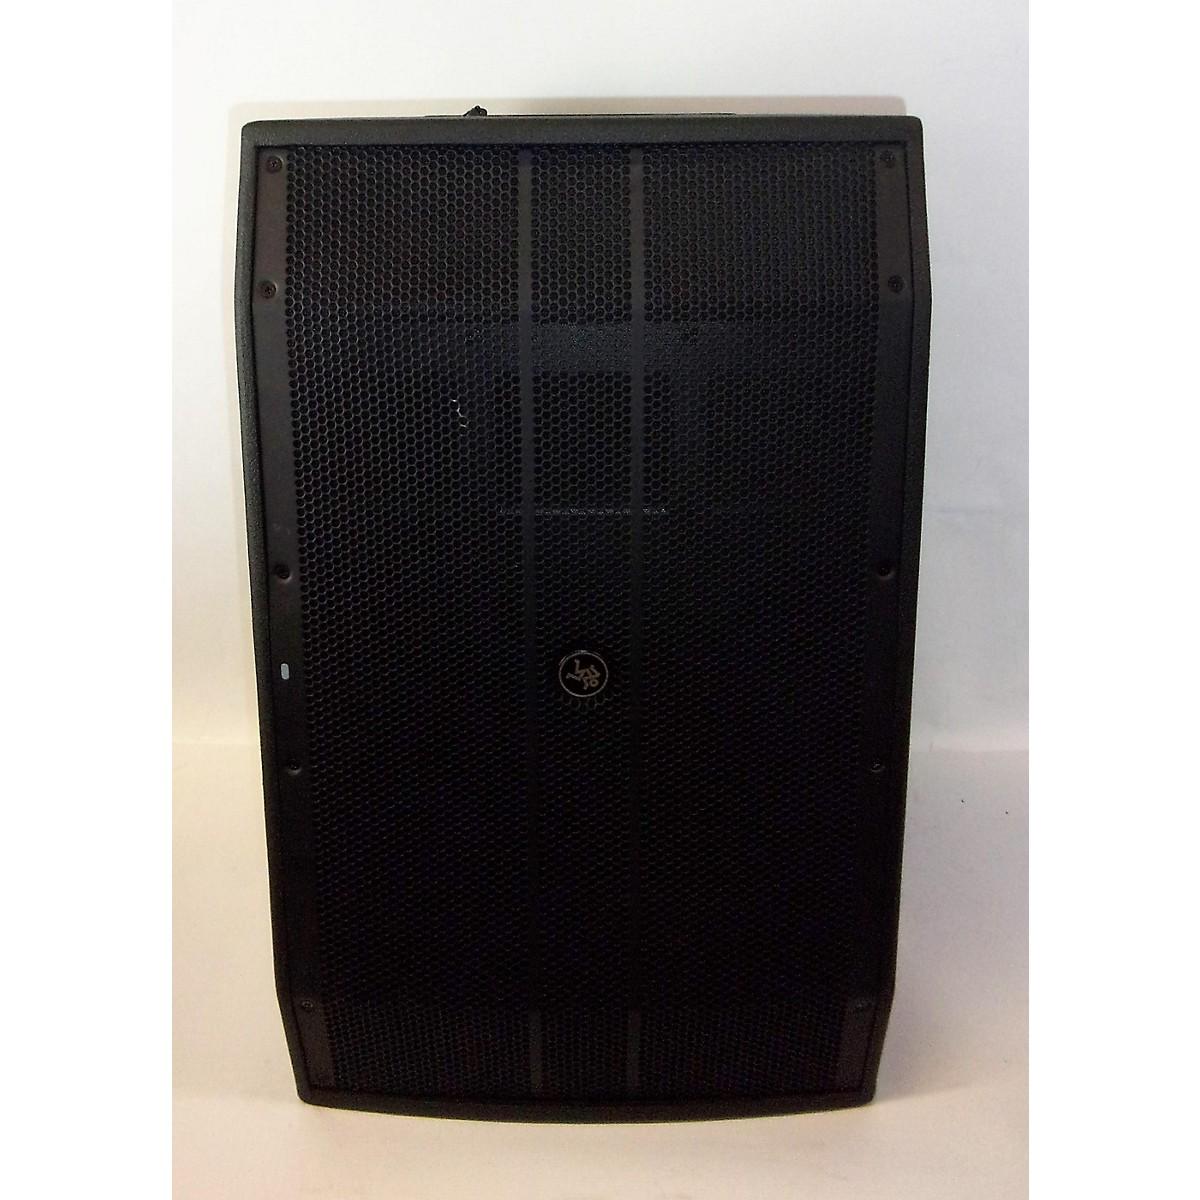 Mackie Drm12a Powered Speaker